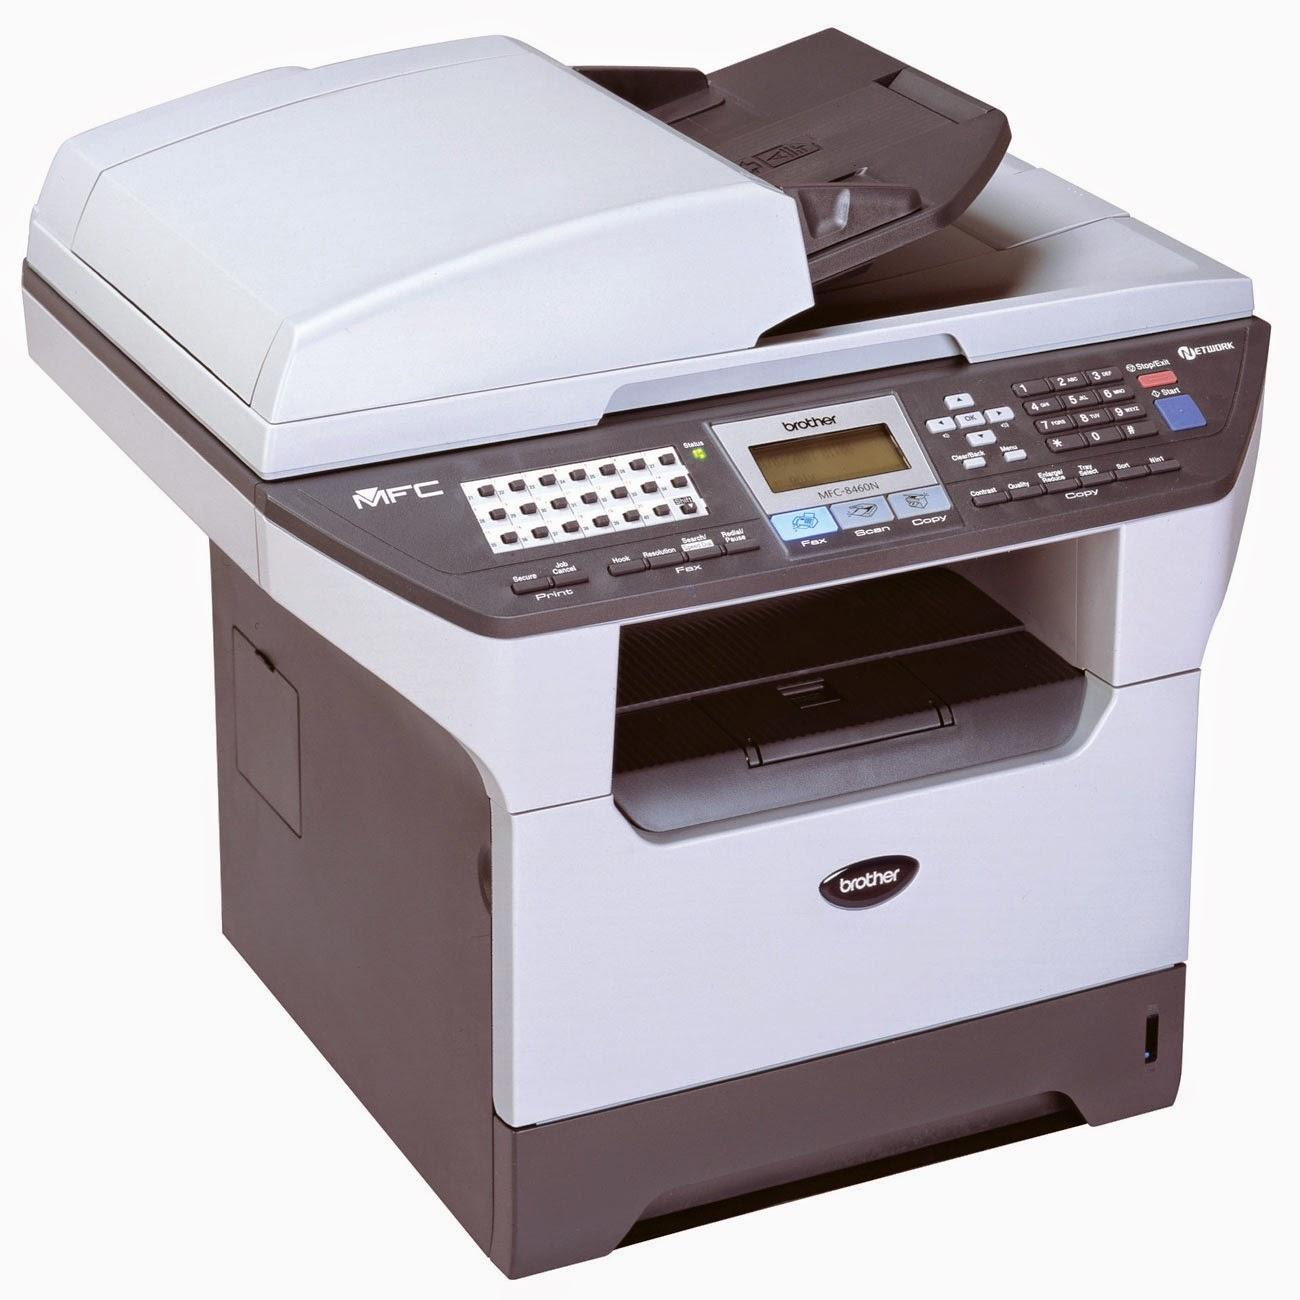 fax machine sounds